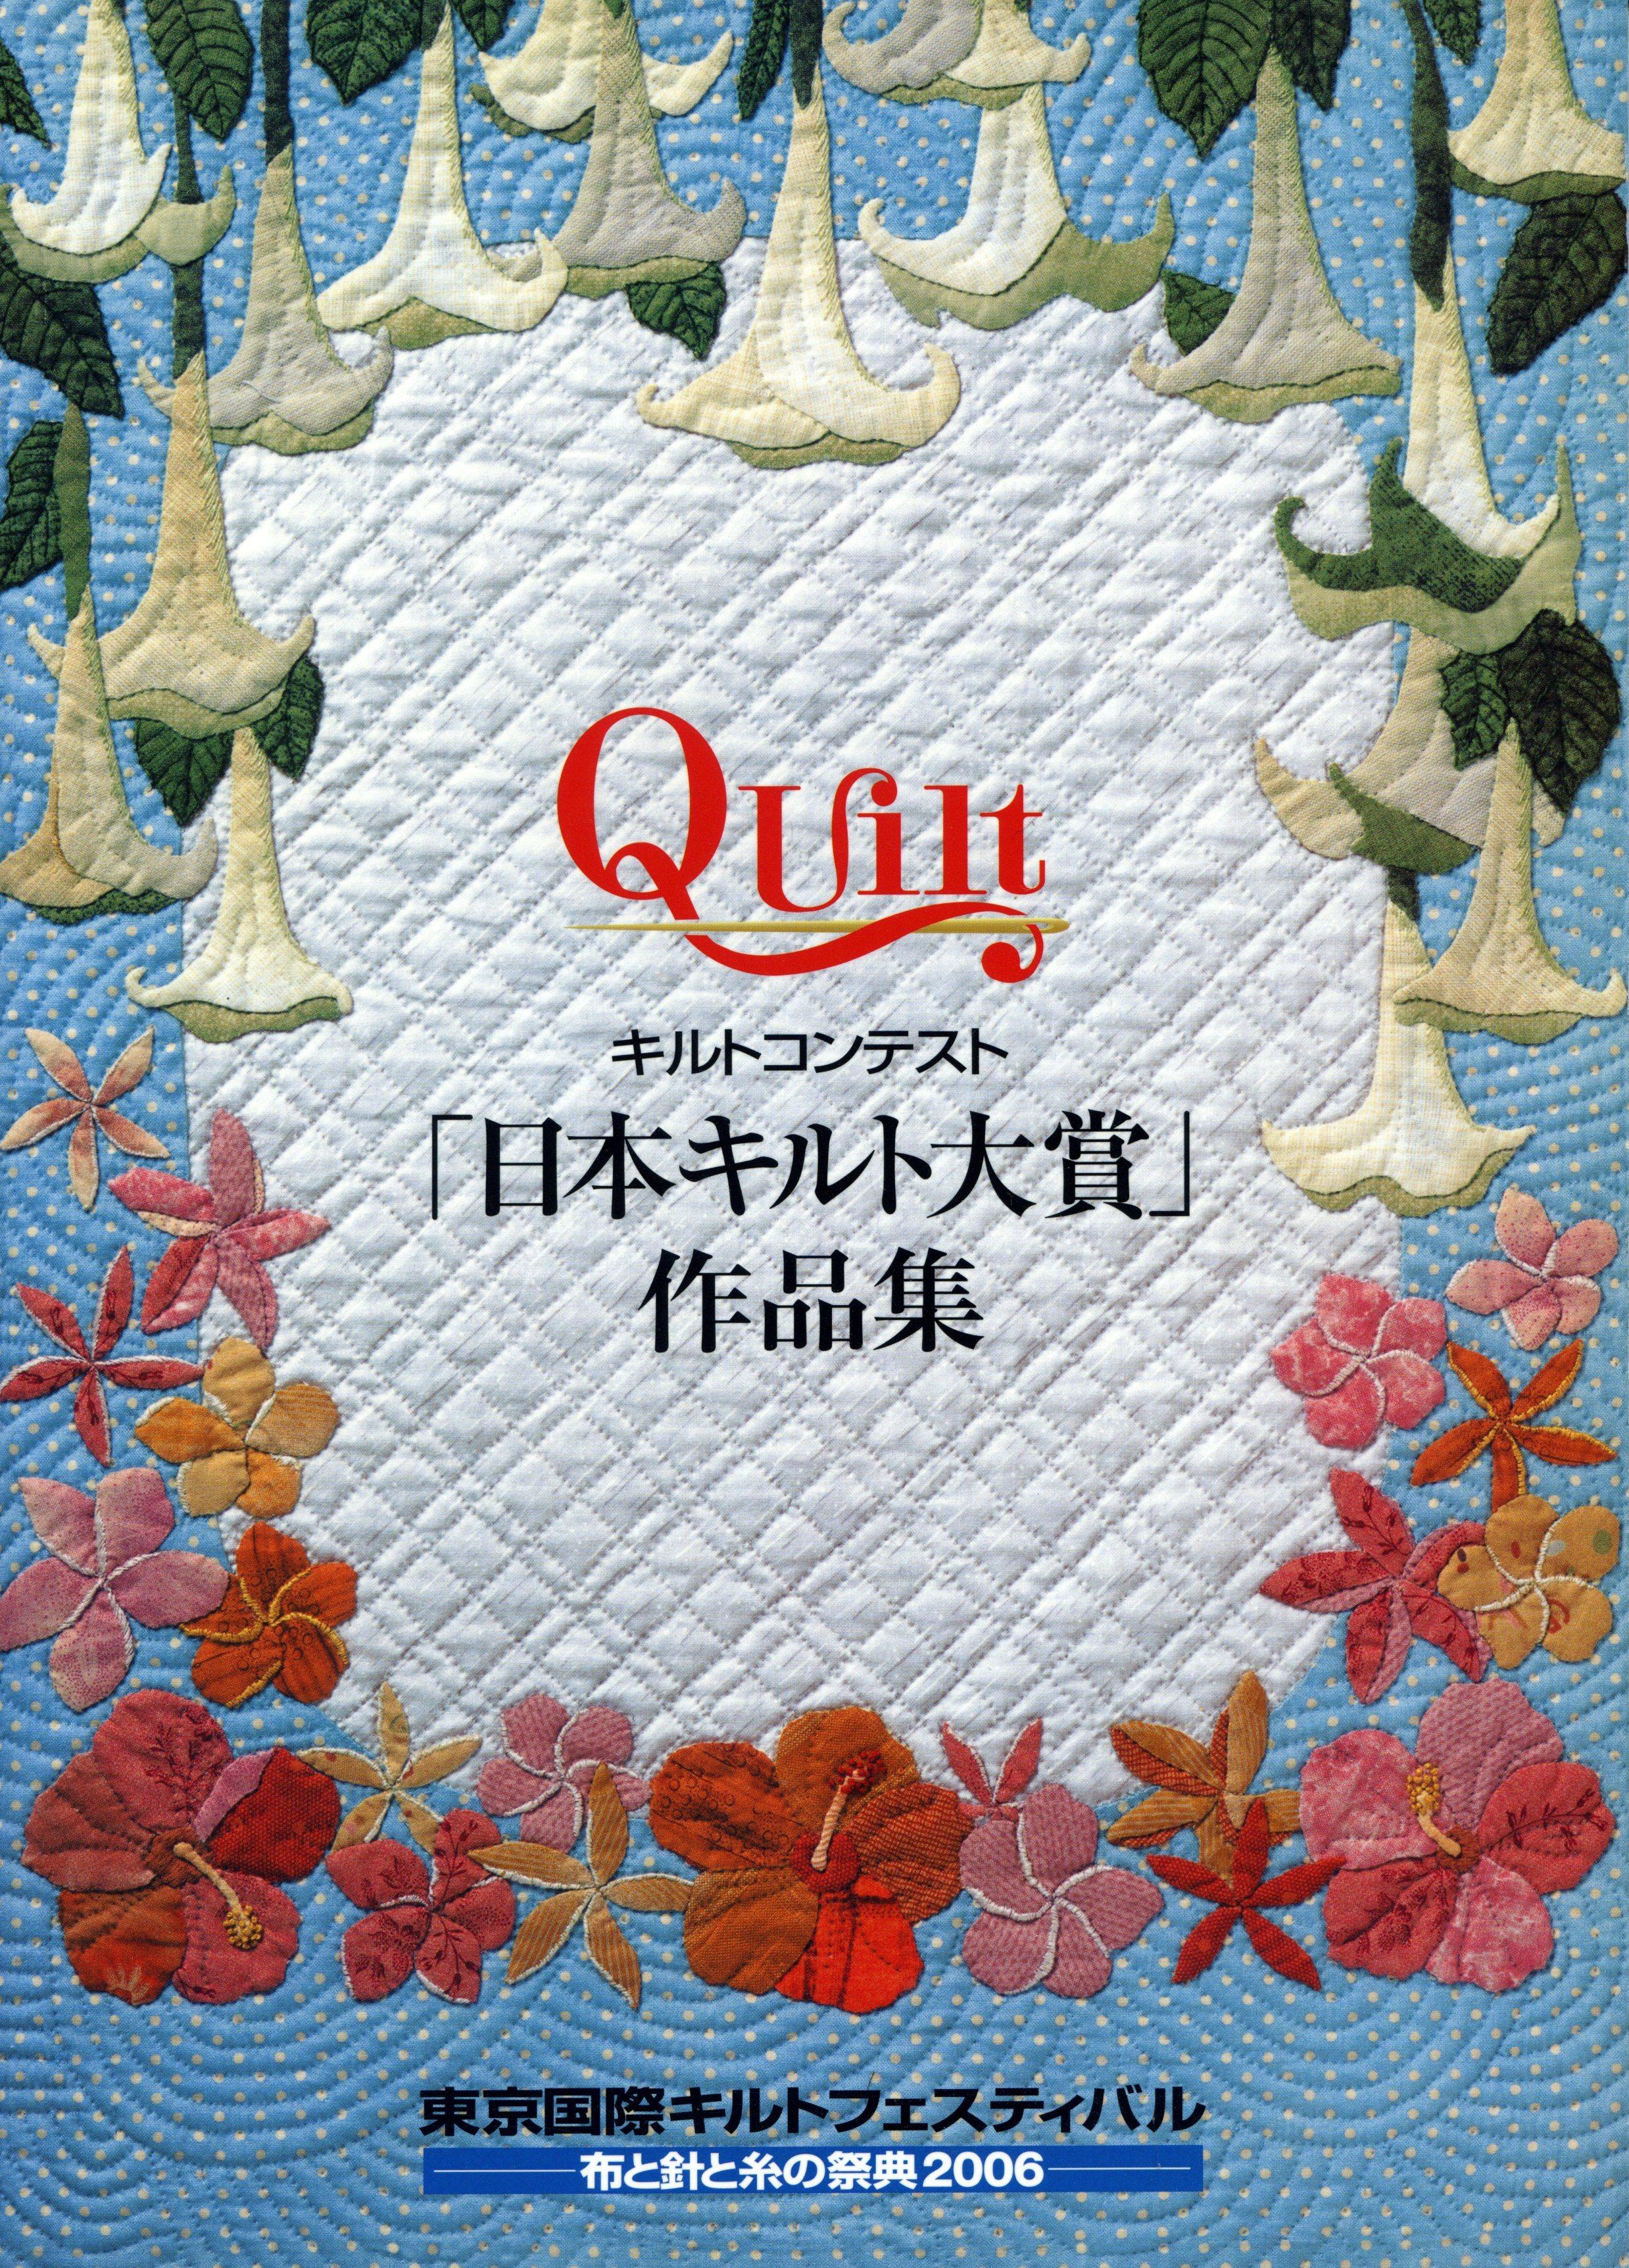 Tokyo Quilt Festival 2006